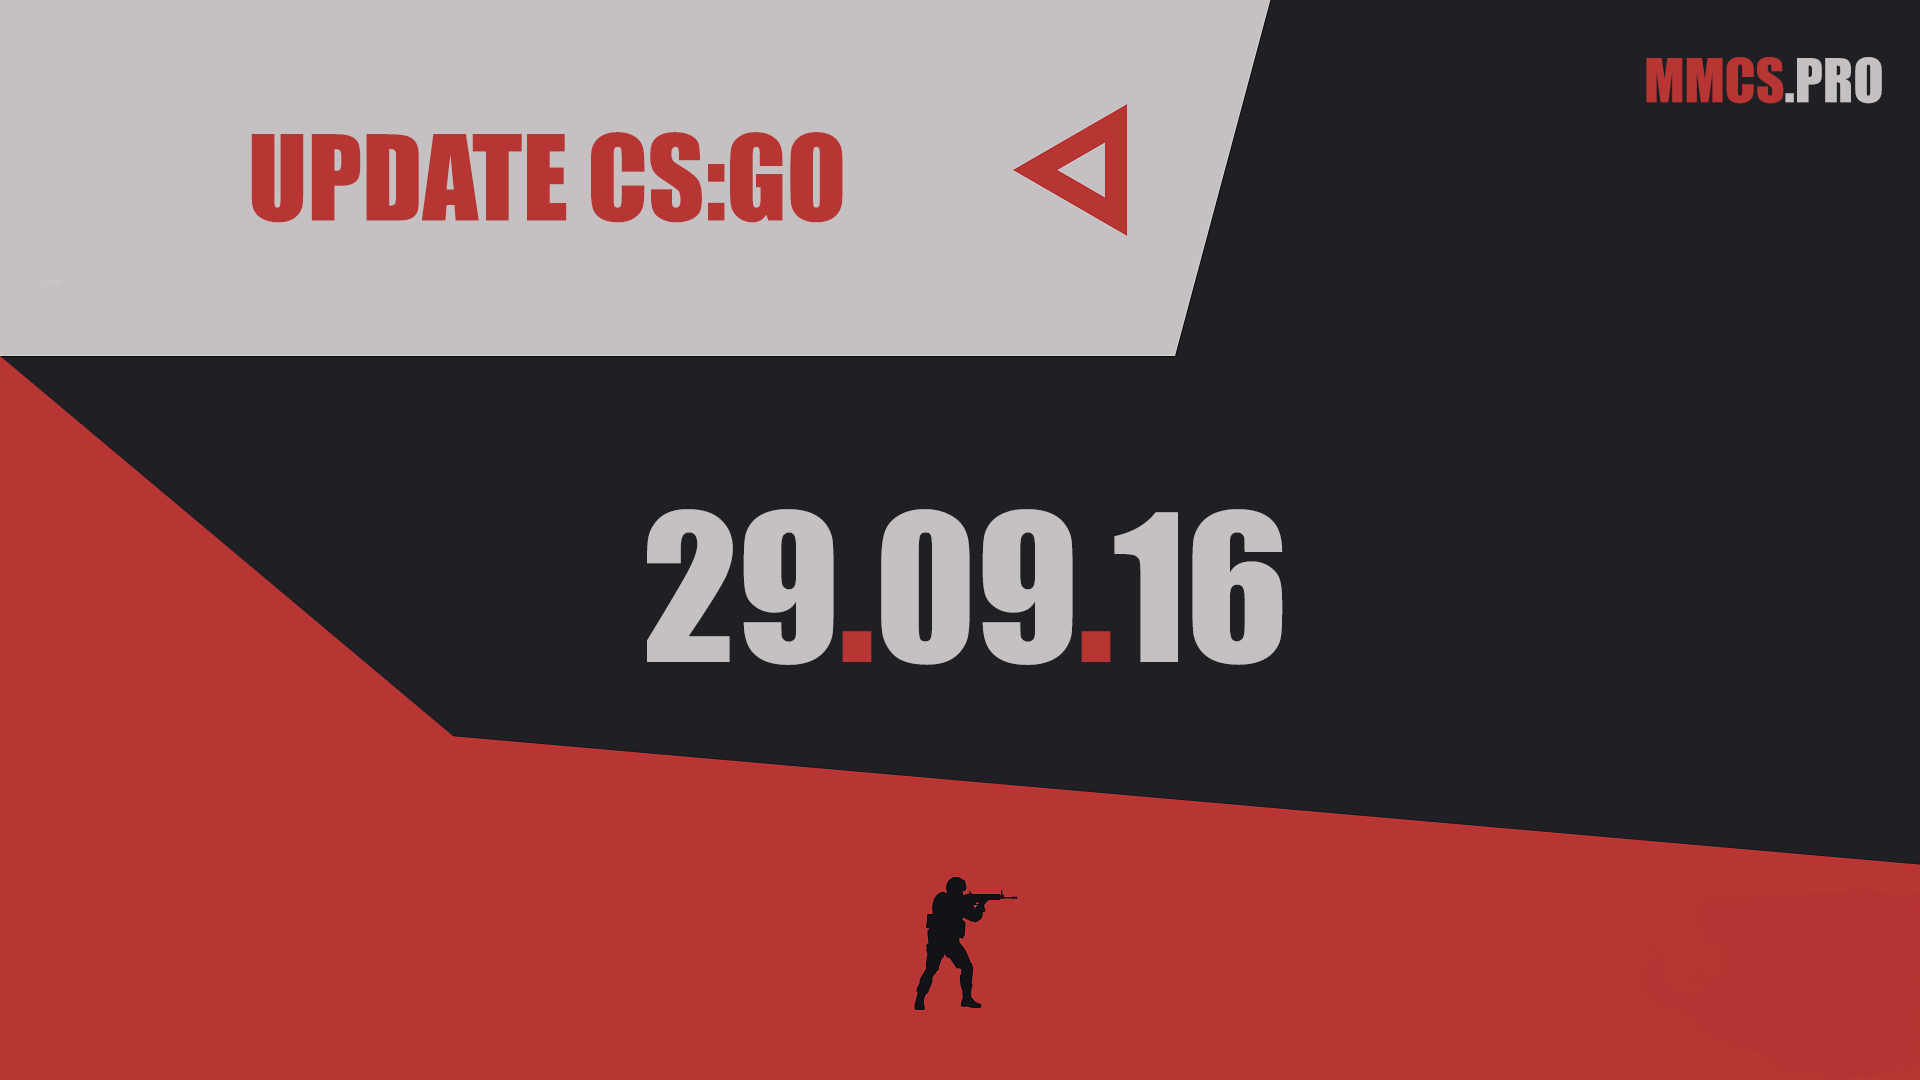 https://mmcs.pro/update-csgo-29-09-2016-valve/